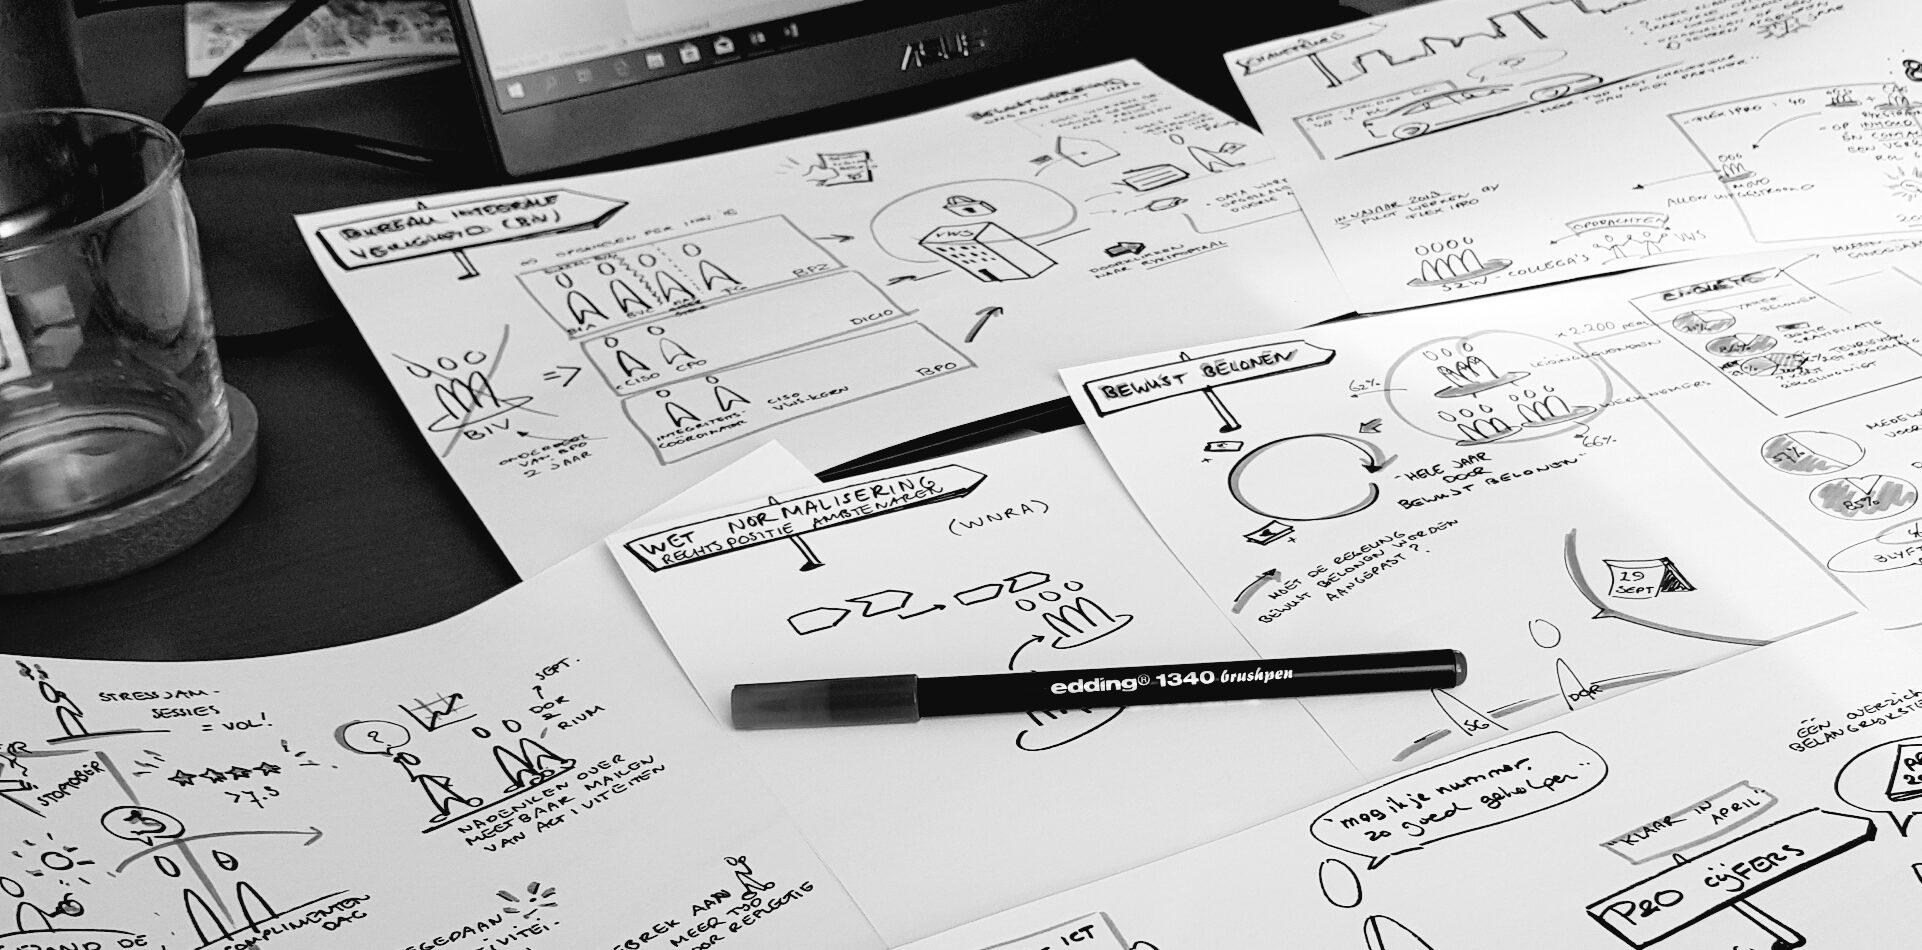 Hopps-visual-thinking-work-in-progress